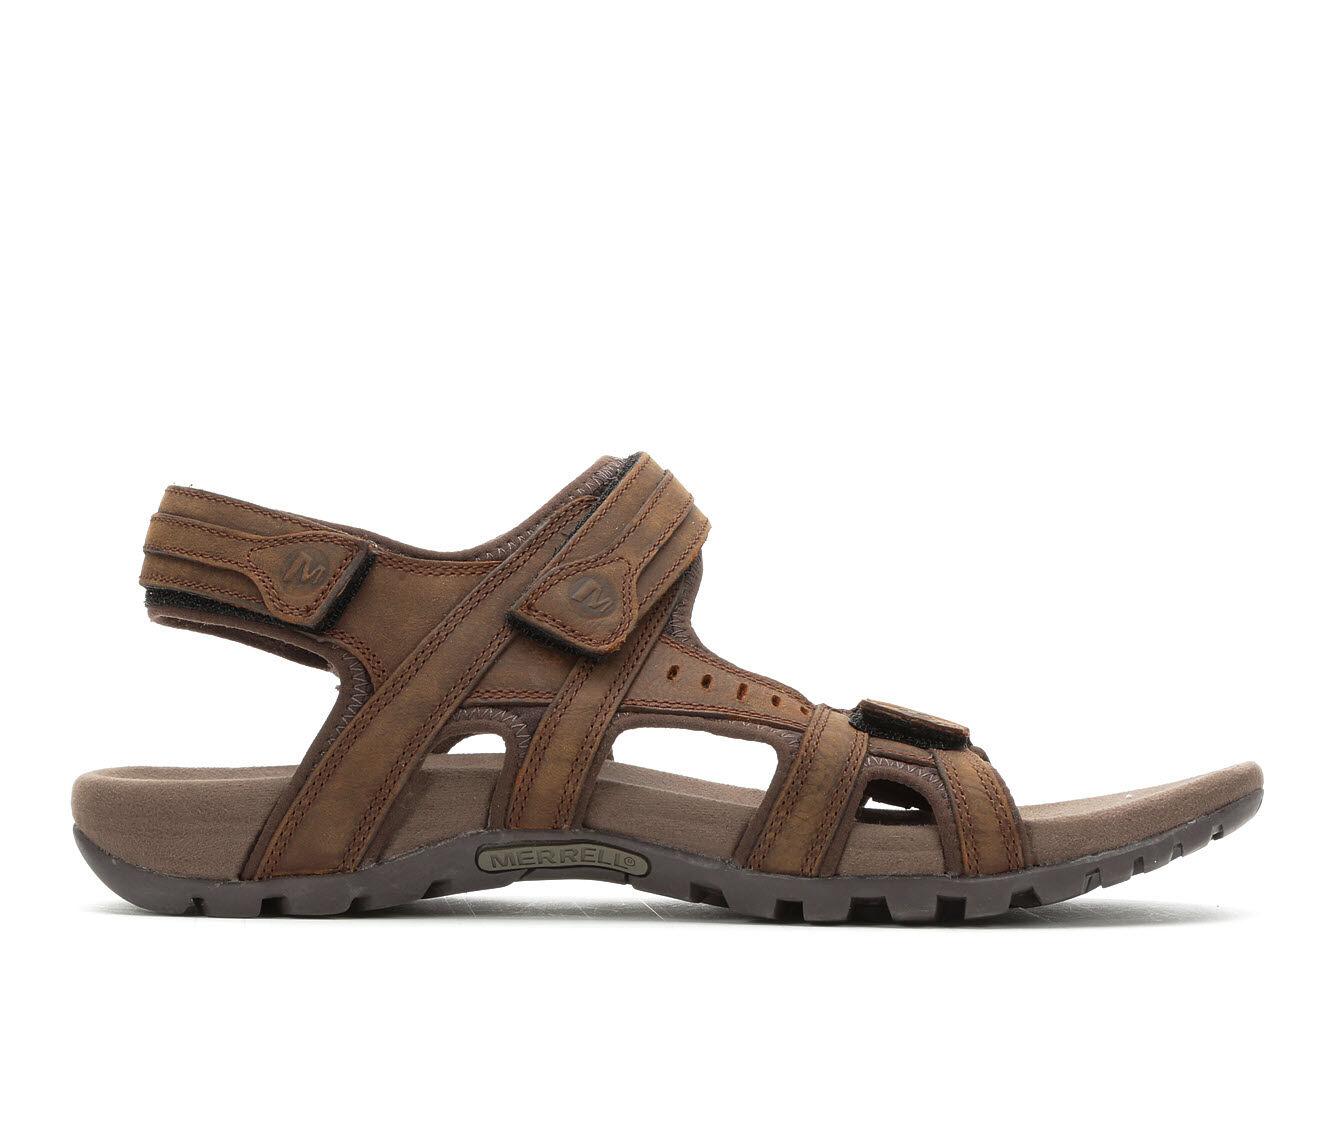 Sandals Men's Sandspur Backstrap Outdoor Lee Merrell k0PnwO